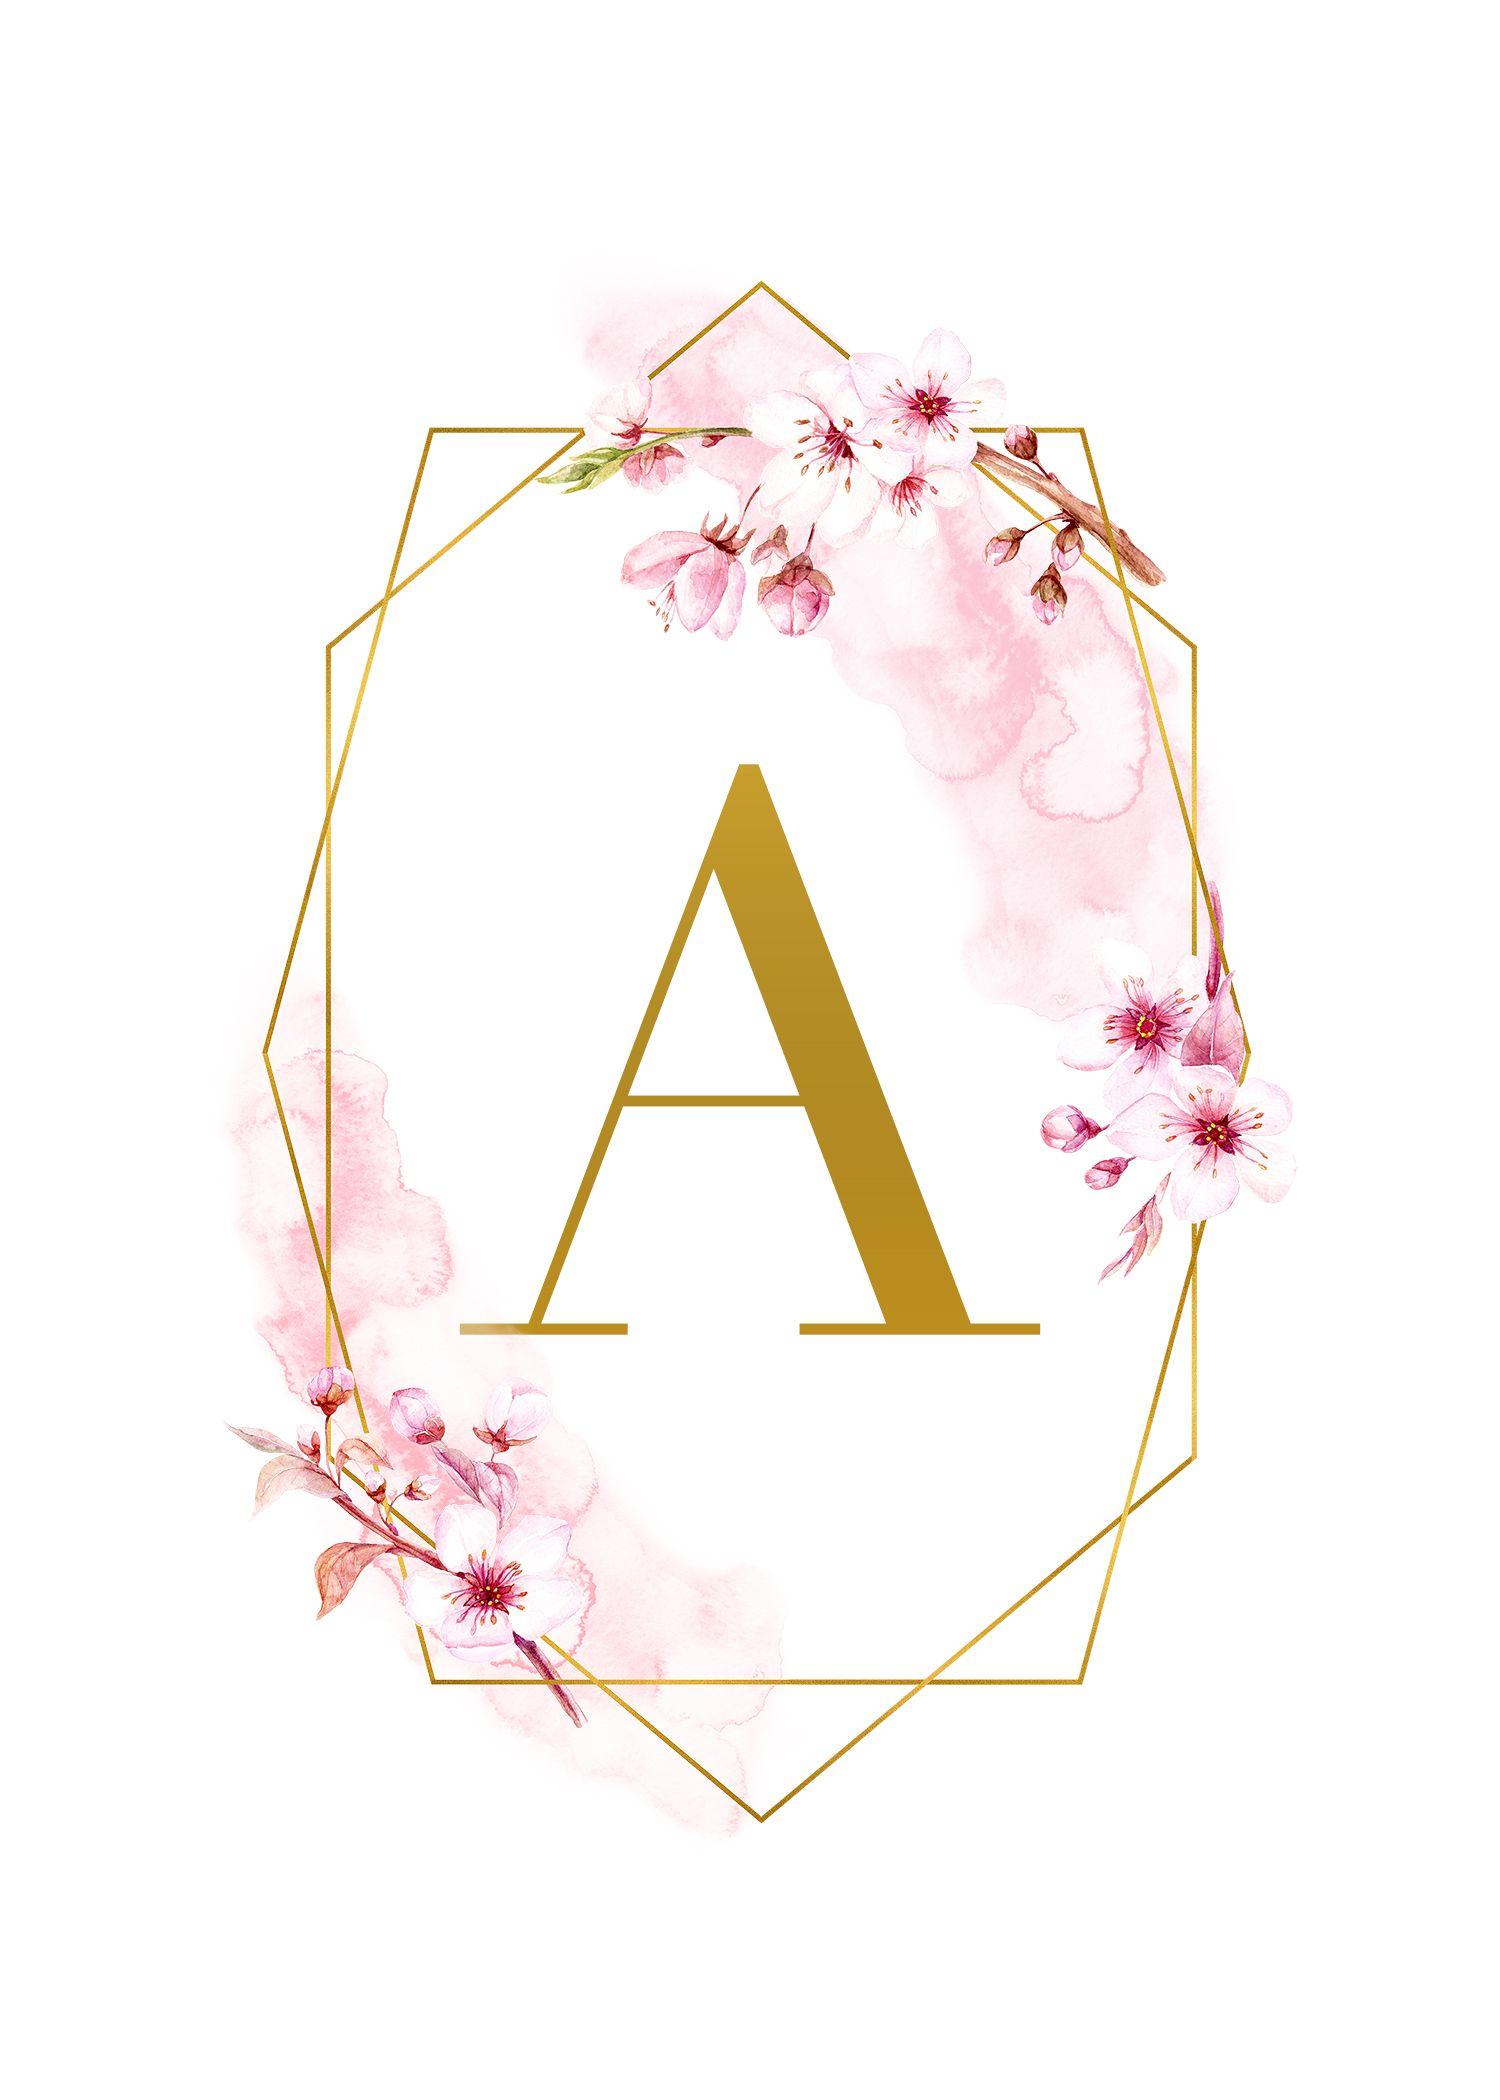 Pin De 50k Belenciaga Em Alea S Zimmer Monograma Papel De Parede Papel De Parede Grafico Letras Com Flores